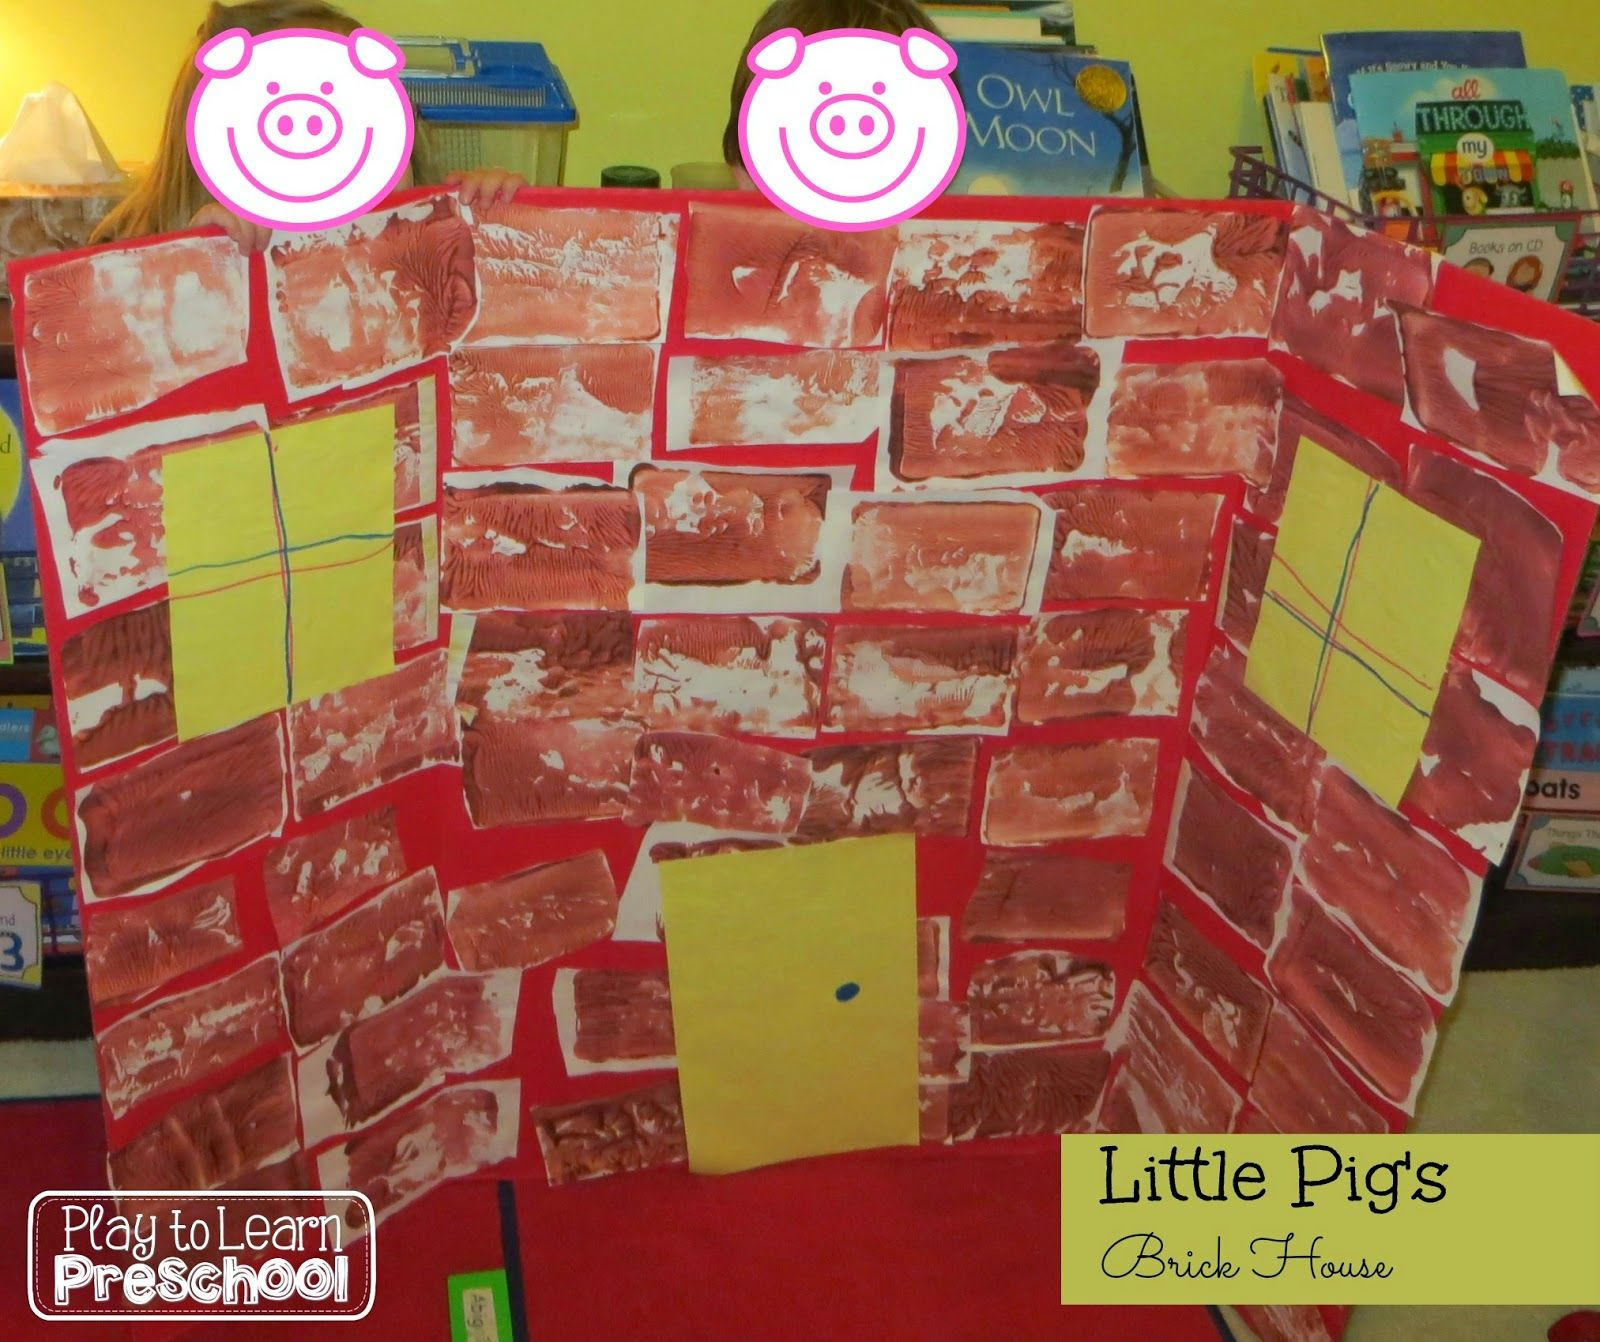 The Three Little Pigs Brick House